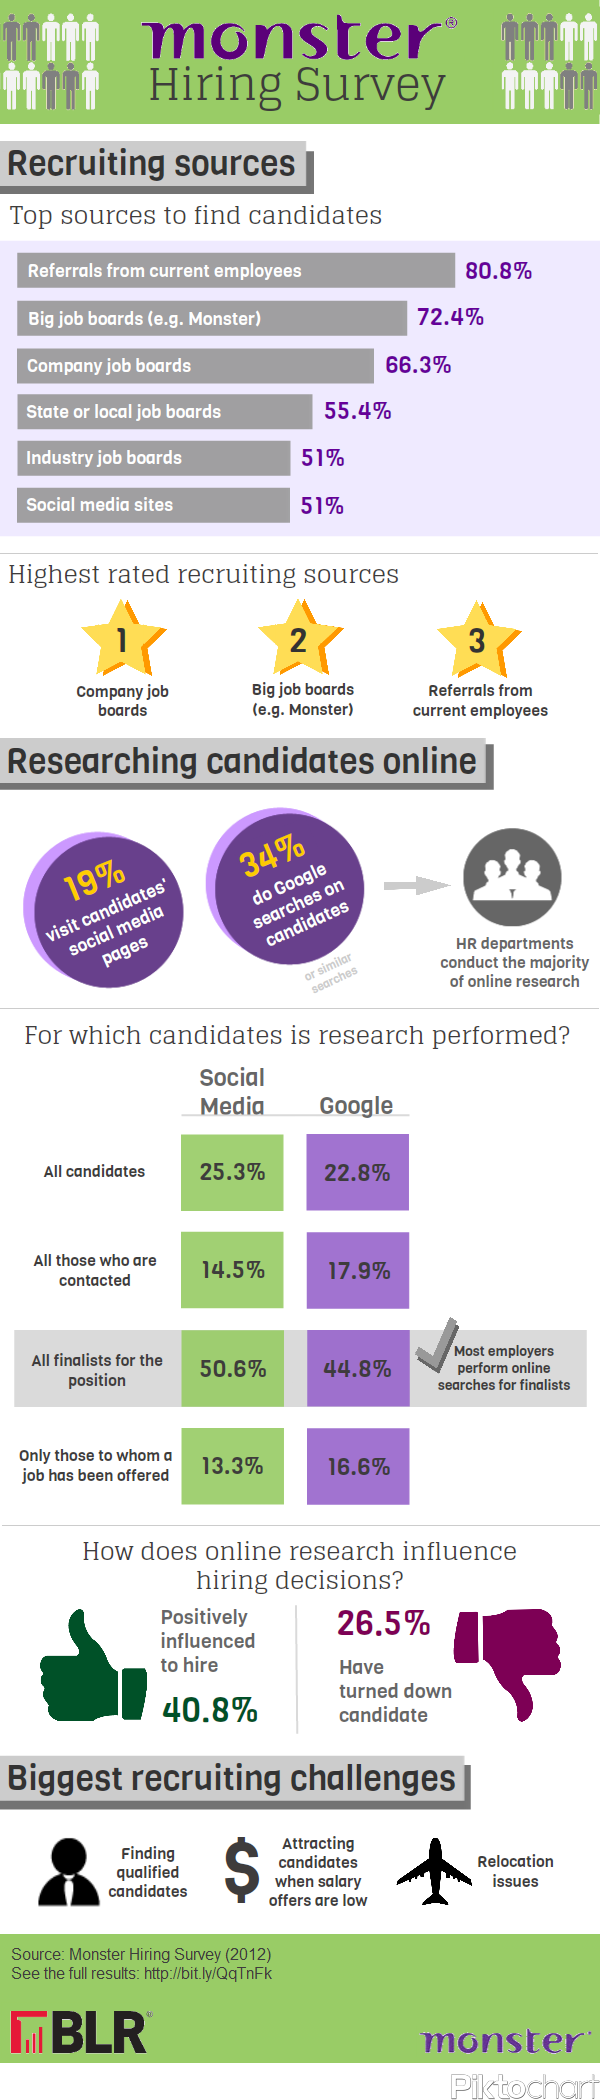 Most effective recruitment methods in 2012